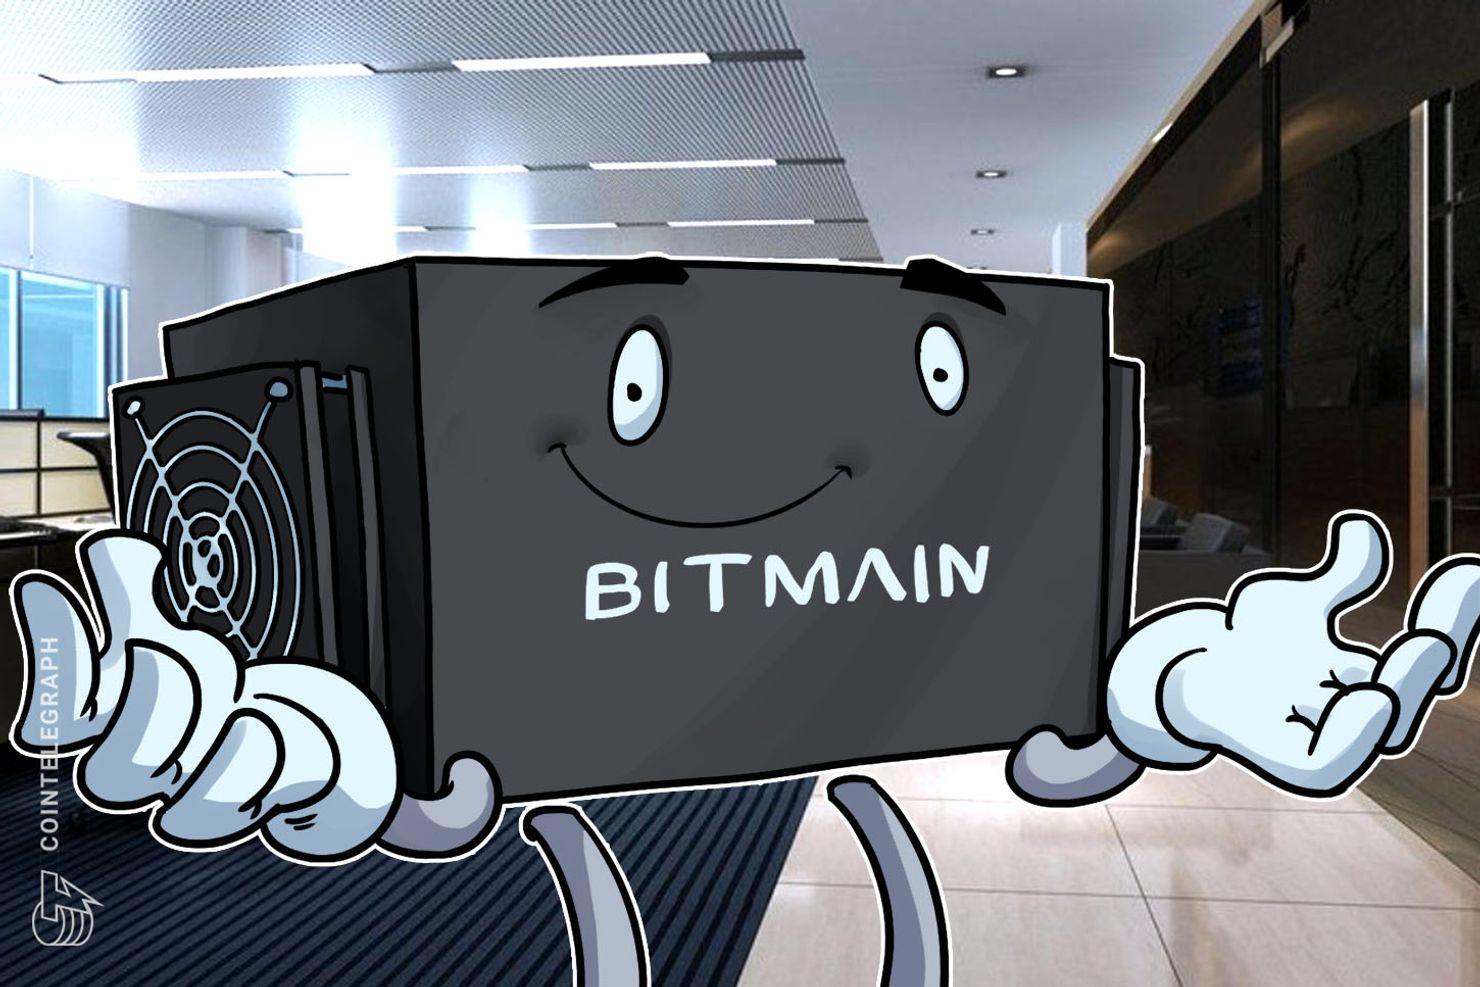 China Bitcoin Mining Behemoth Bitmain Releases New 7nm Antminer Power Probe Short Circuit Detector Kit Pricefallscom Hardware